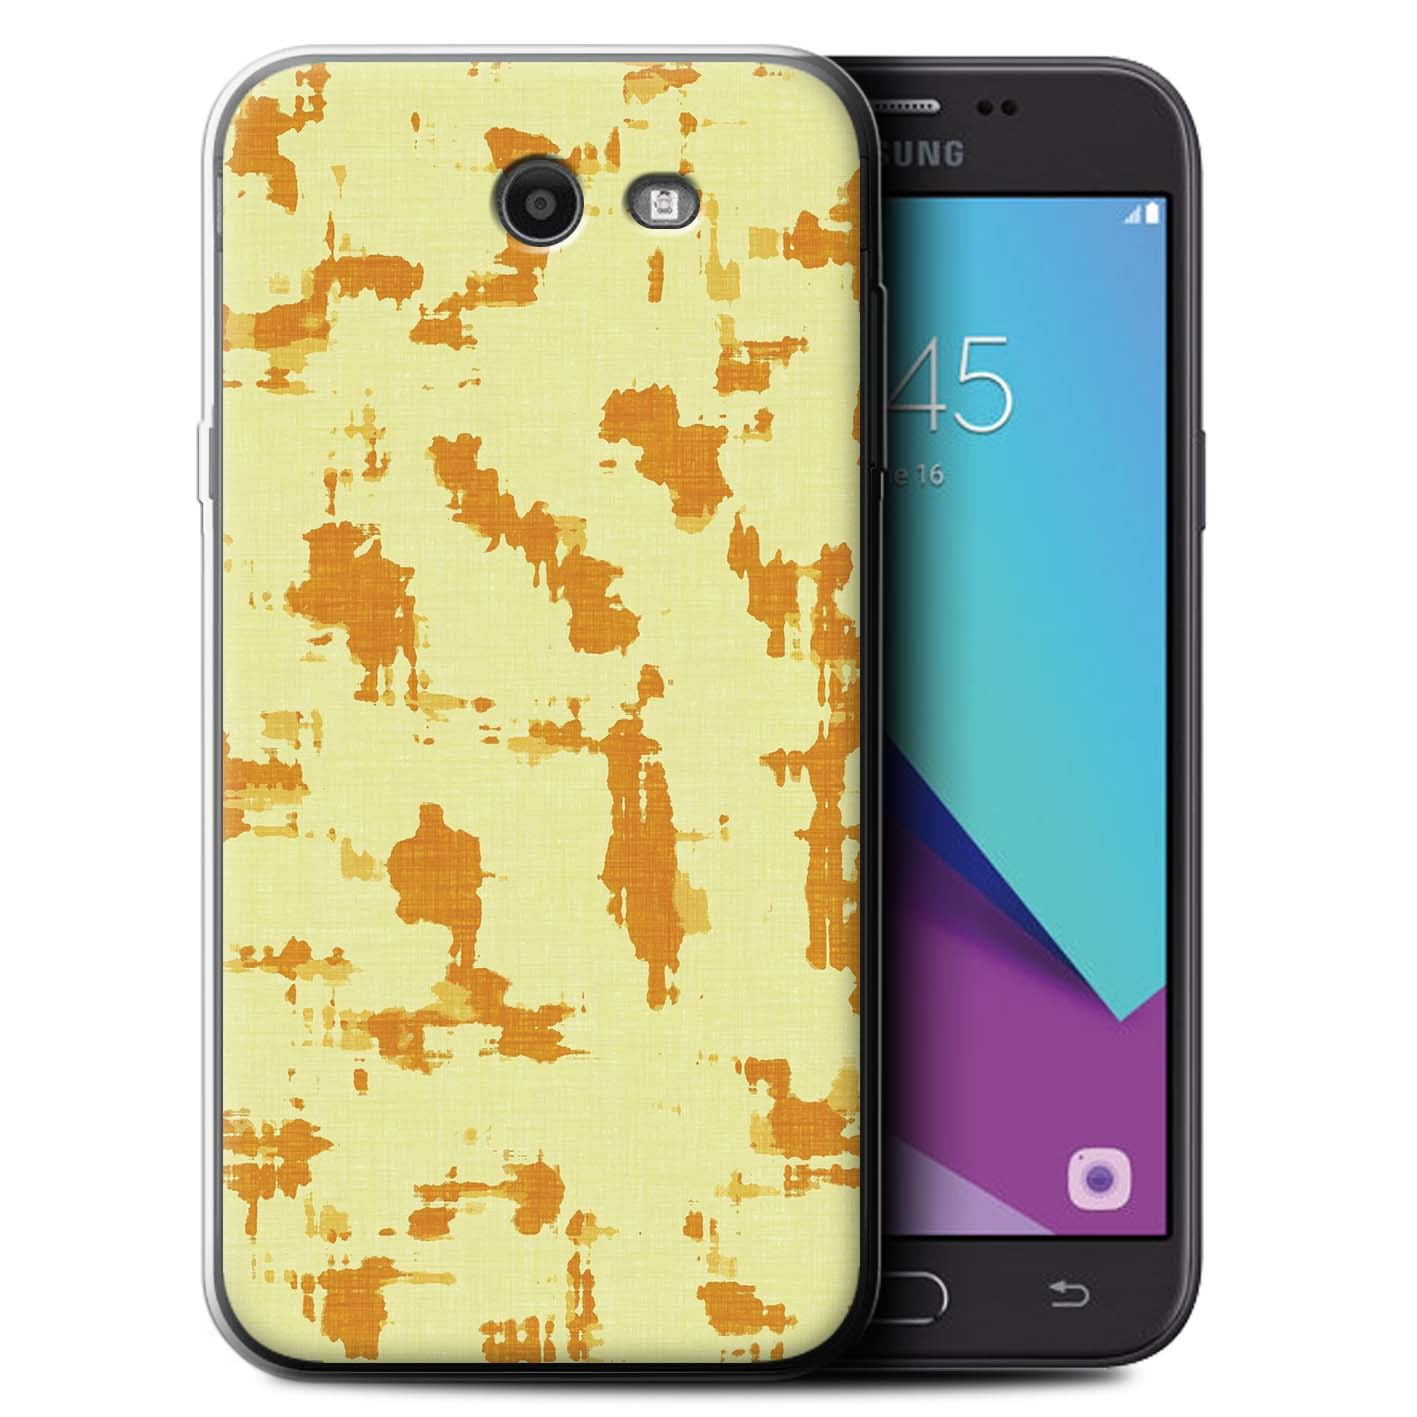 Gel-TPU-Coque-Etui-de-Stuff4-pour-Samsung-Galaxy-J7-2017-J727-Mode-Jaune